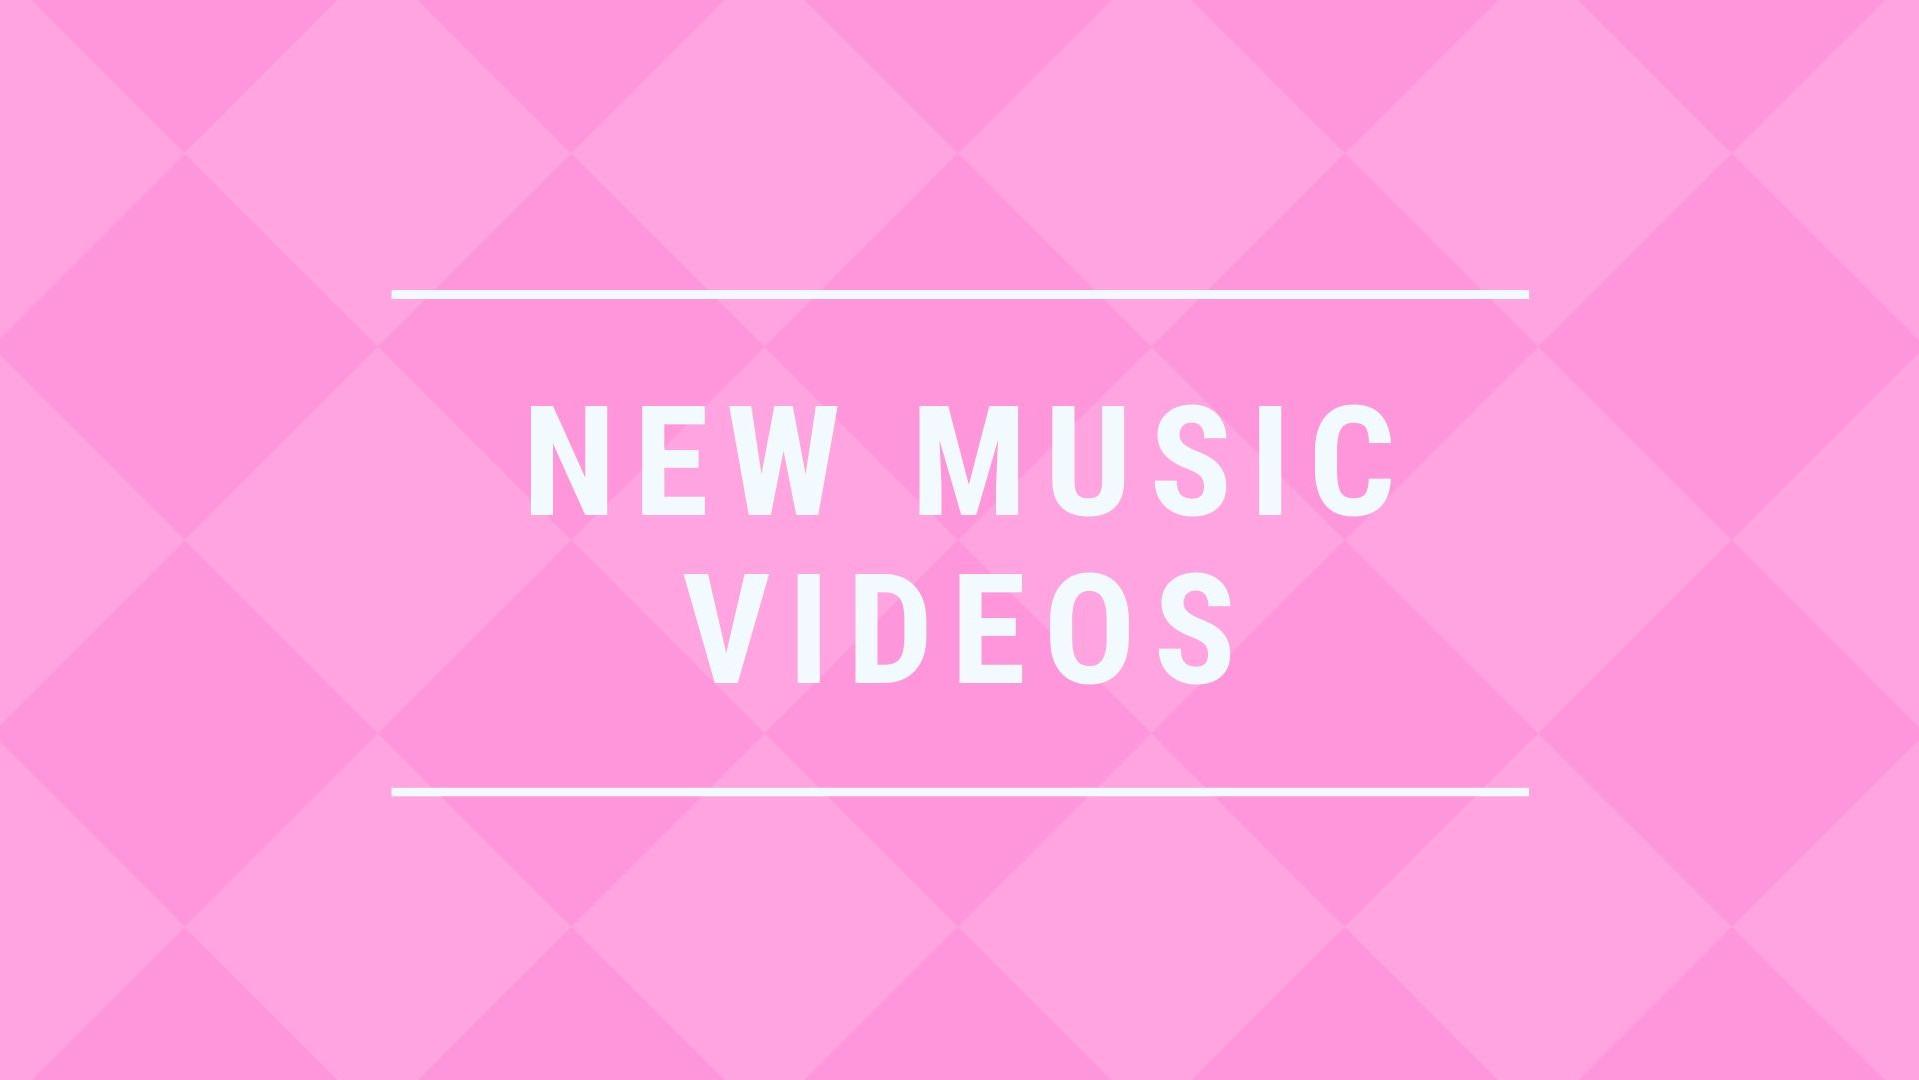 New Music Videos.jpg